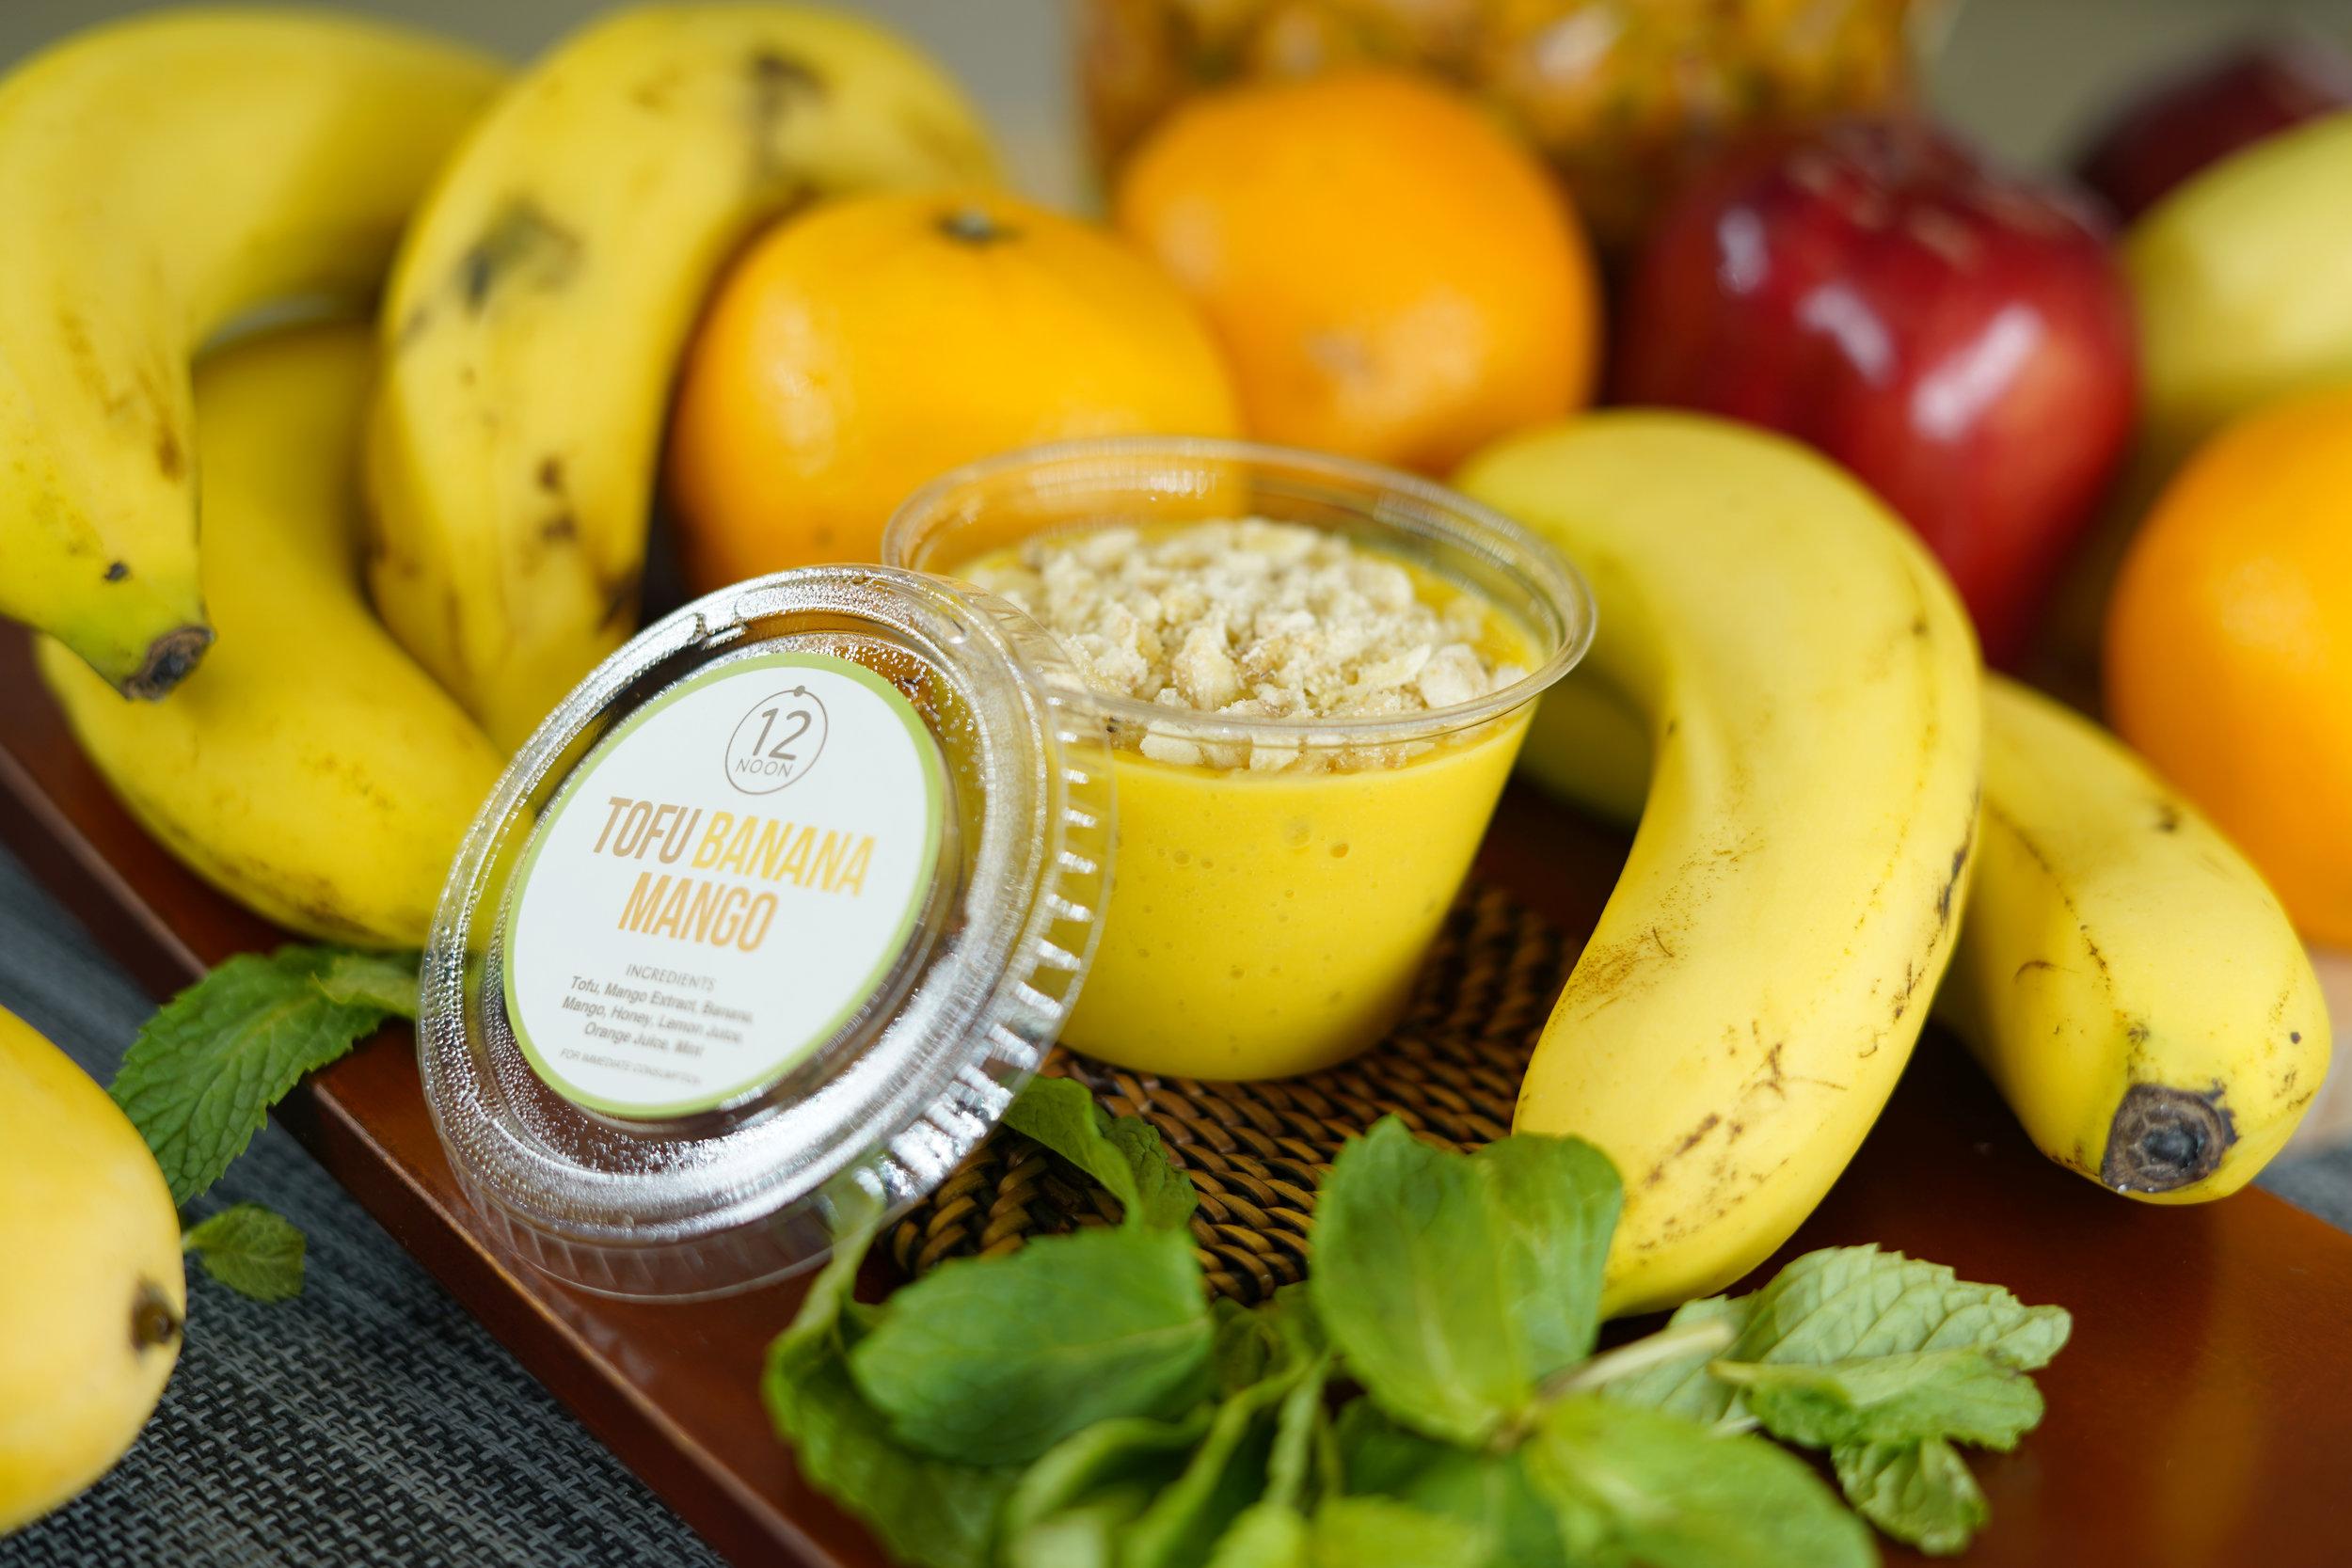 TOFU BANANA & MANGO - 24.6 KCAL PER SERVINGTofu, Banana, Mango, Mango Puree, Honey, Lemon Juice, Orange Juice.$18